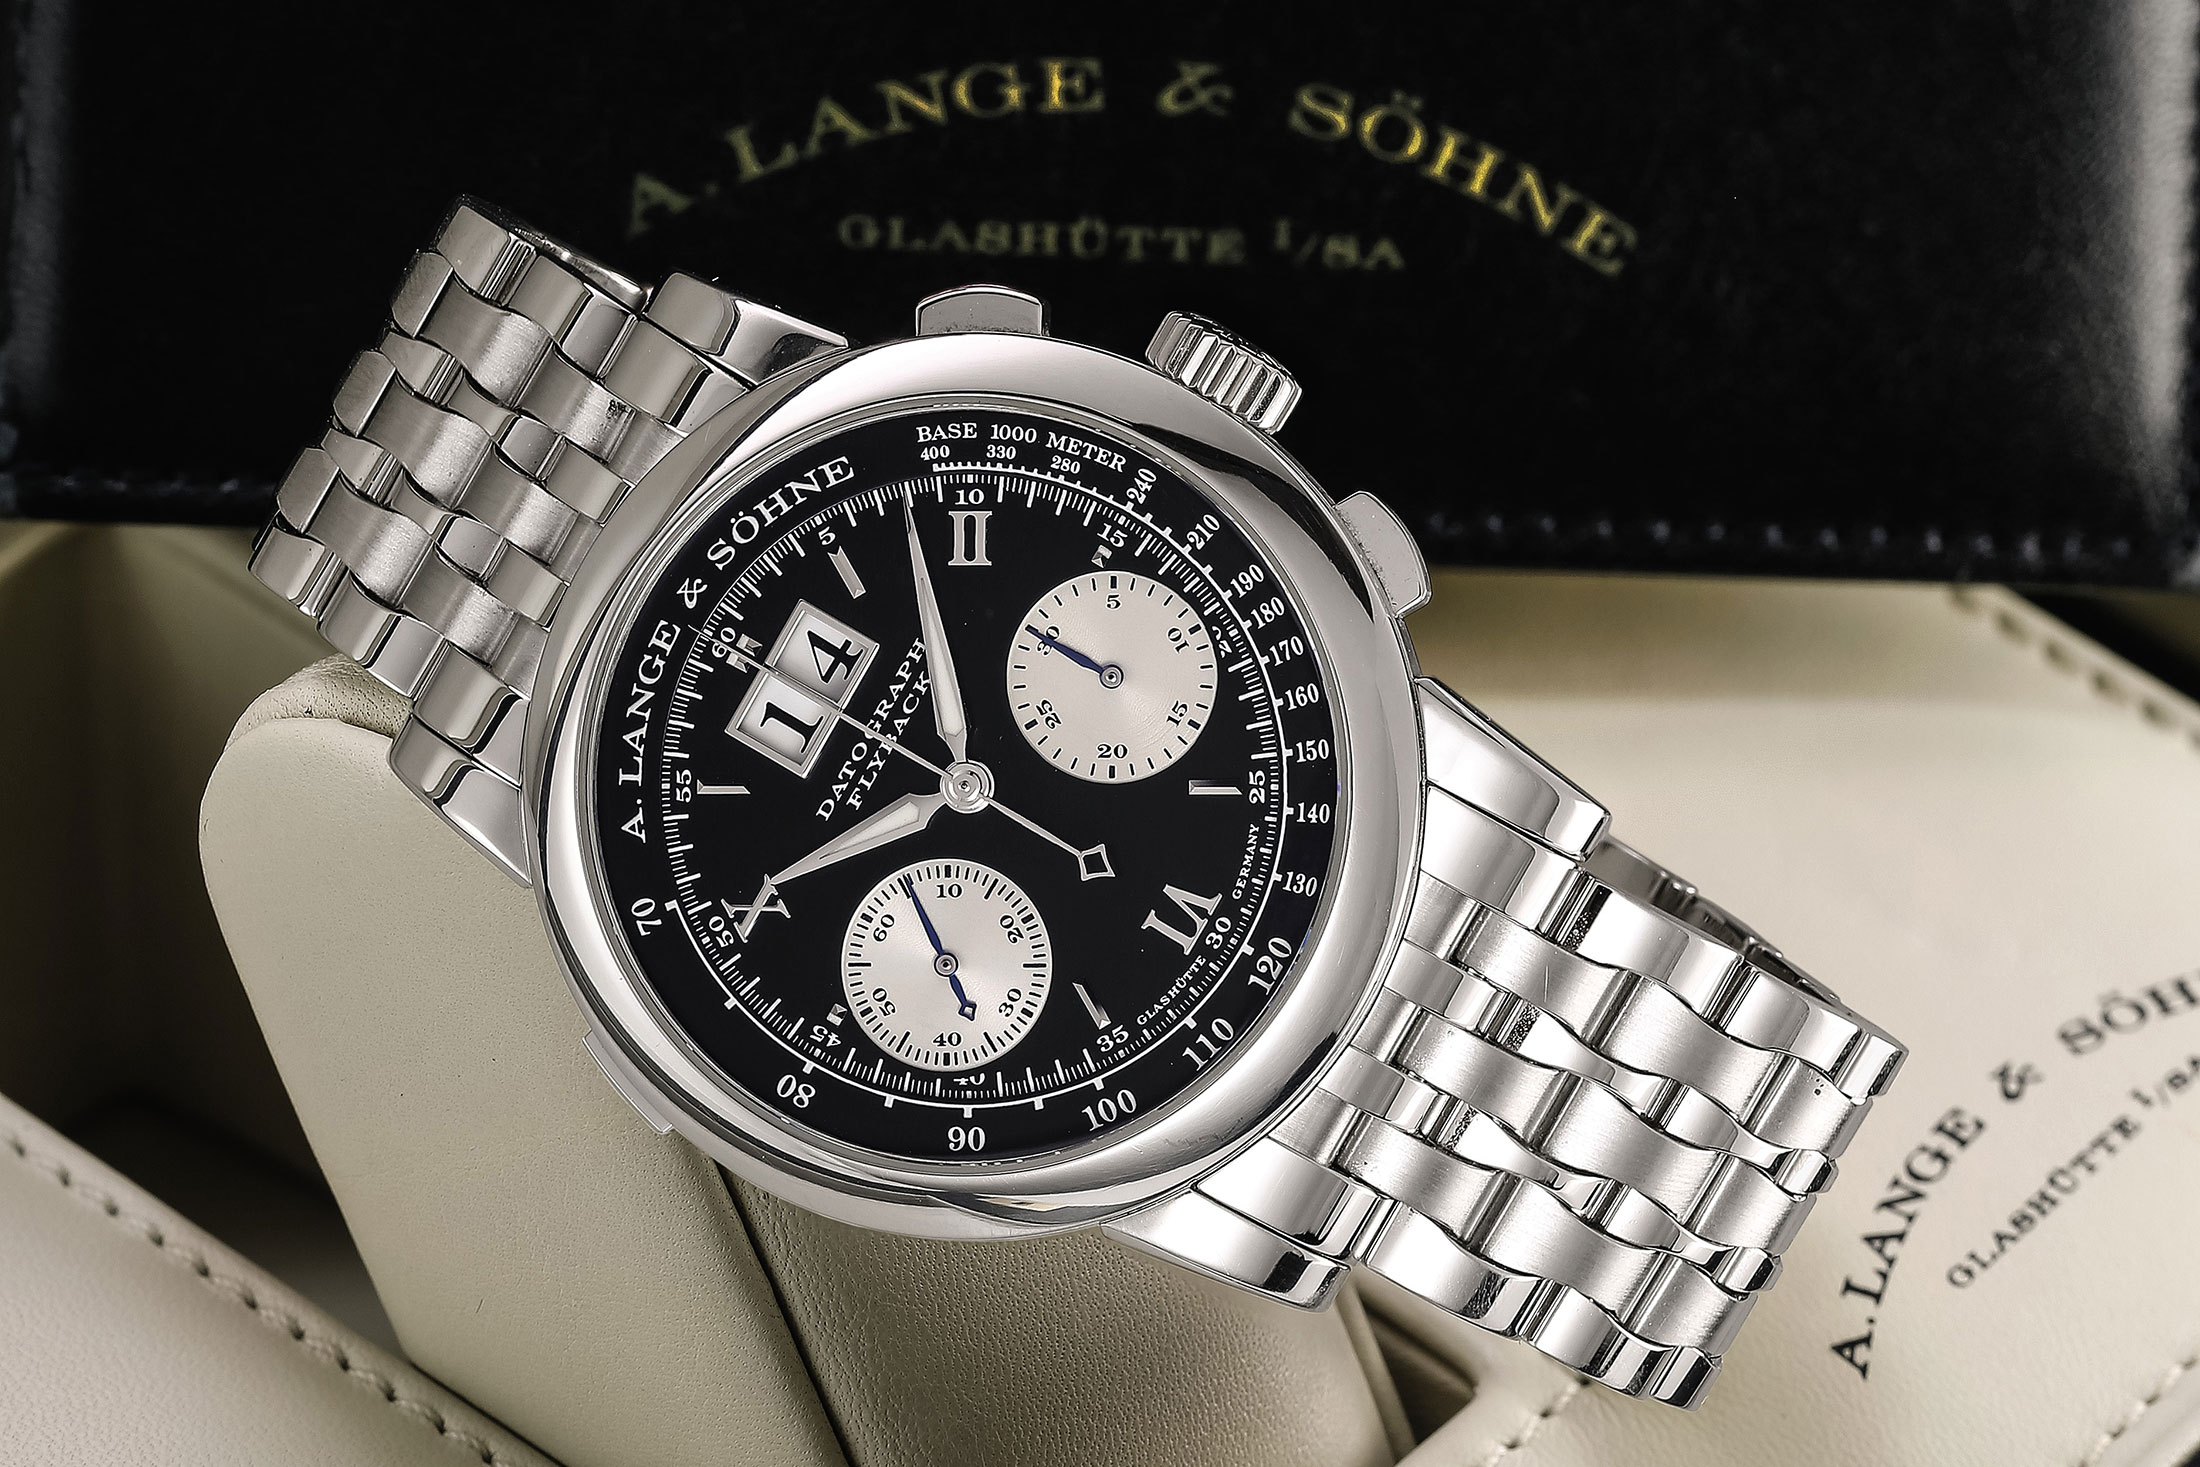 A. Lange & Söhne Datograph With Bracelet (Lot 113)